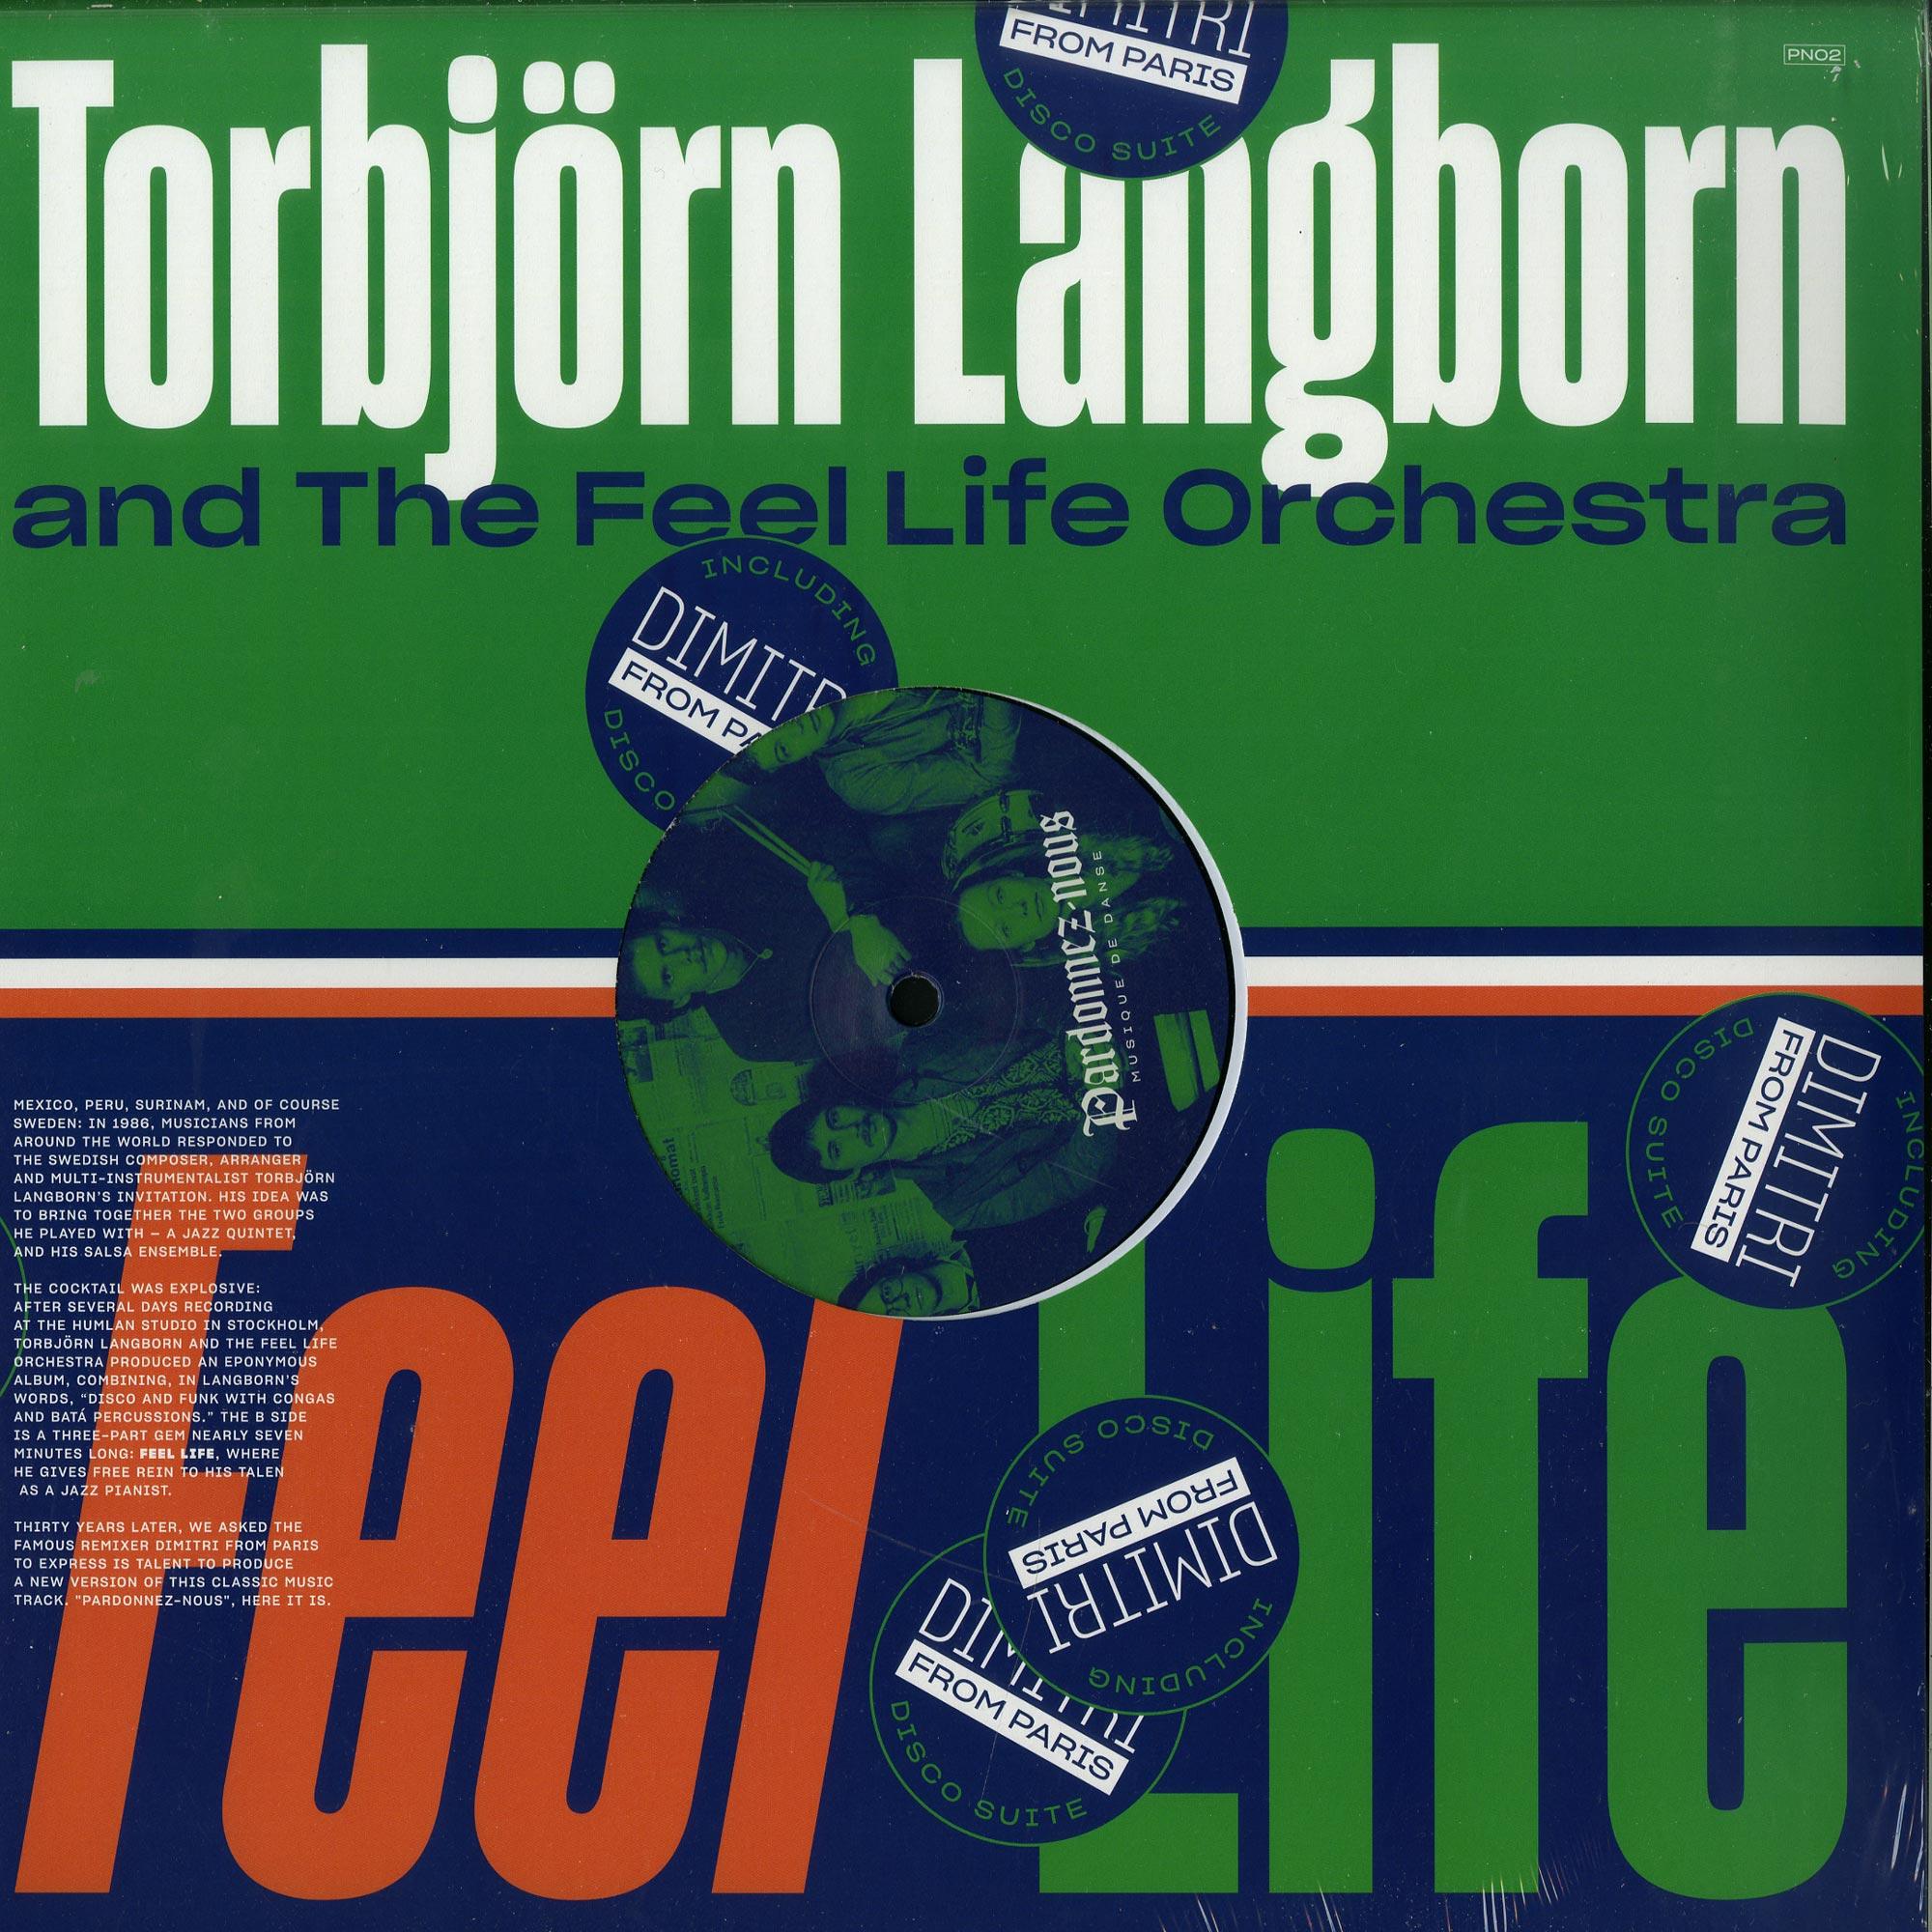 Torbjoern Langborn & The Feel Life Orchestra - FEEL LIFE